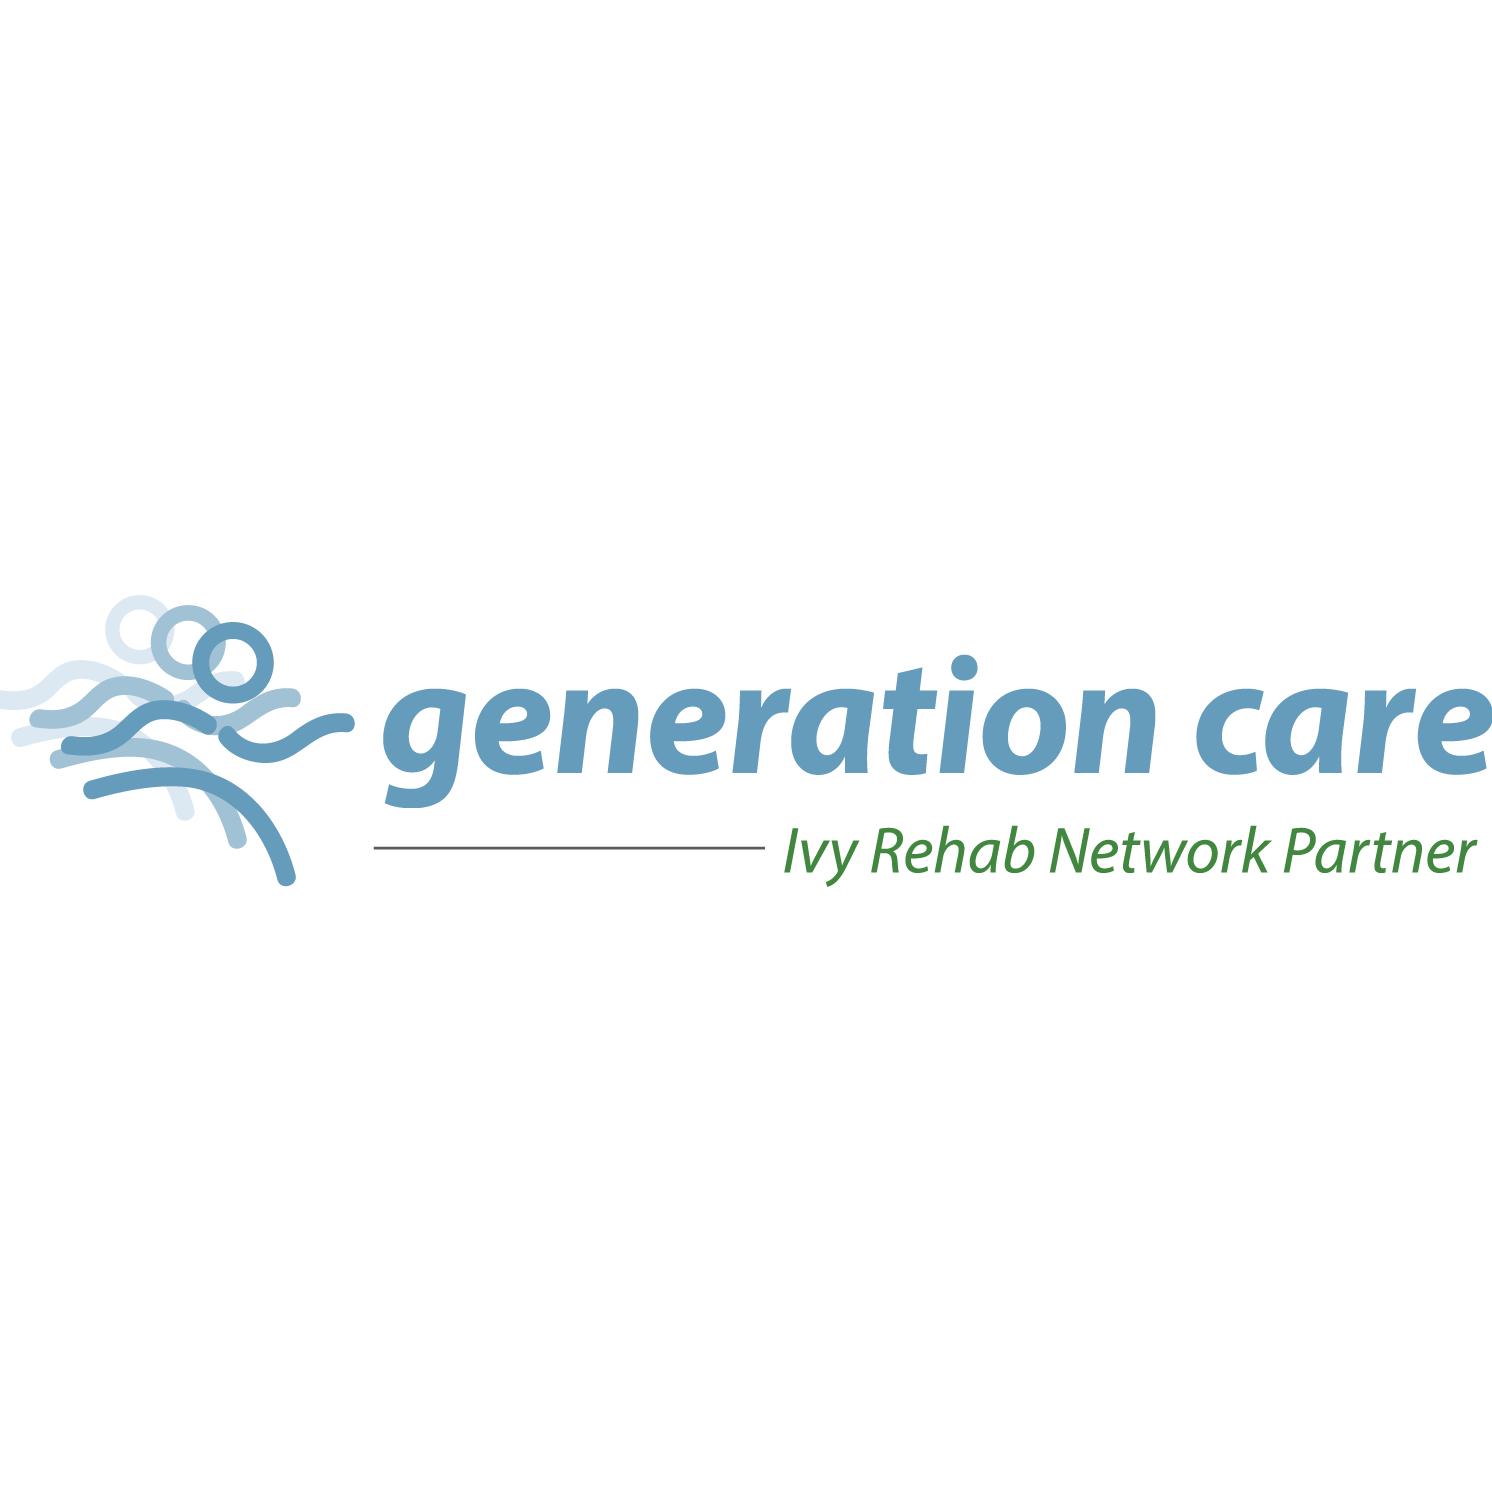 Generation Care